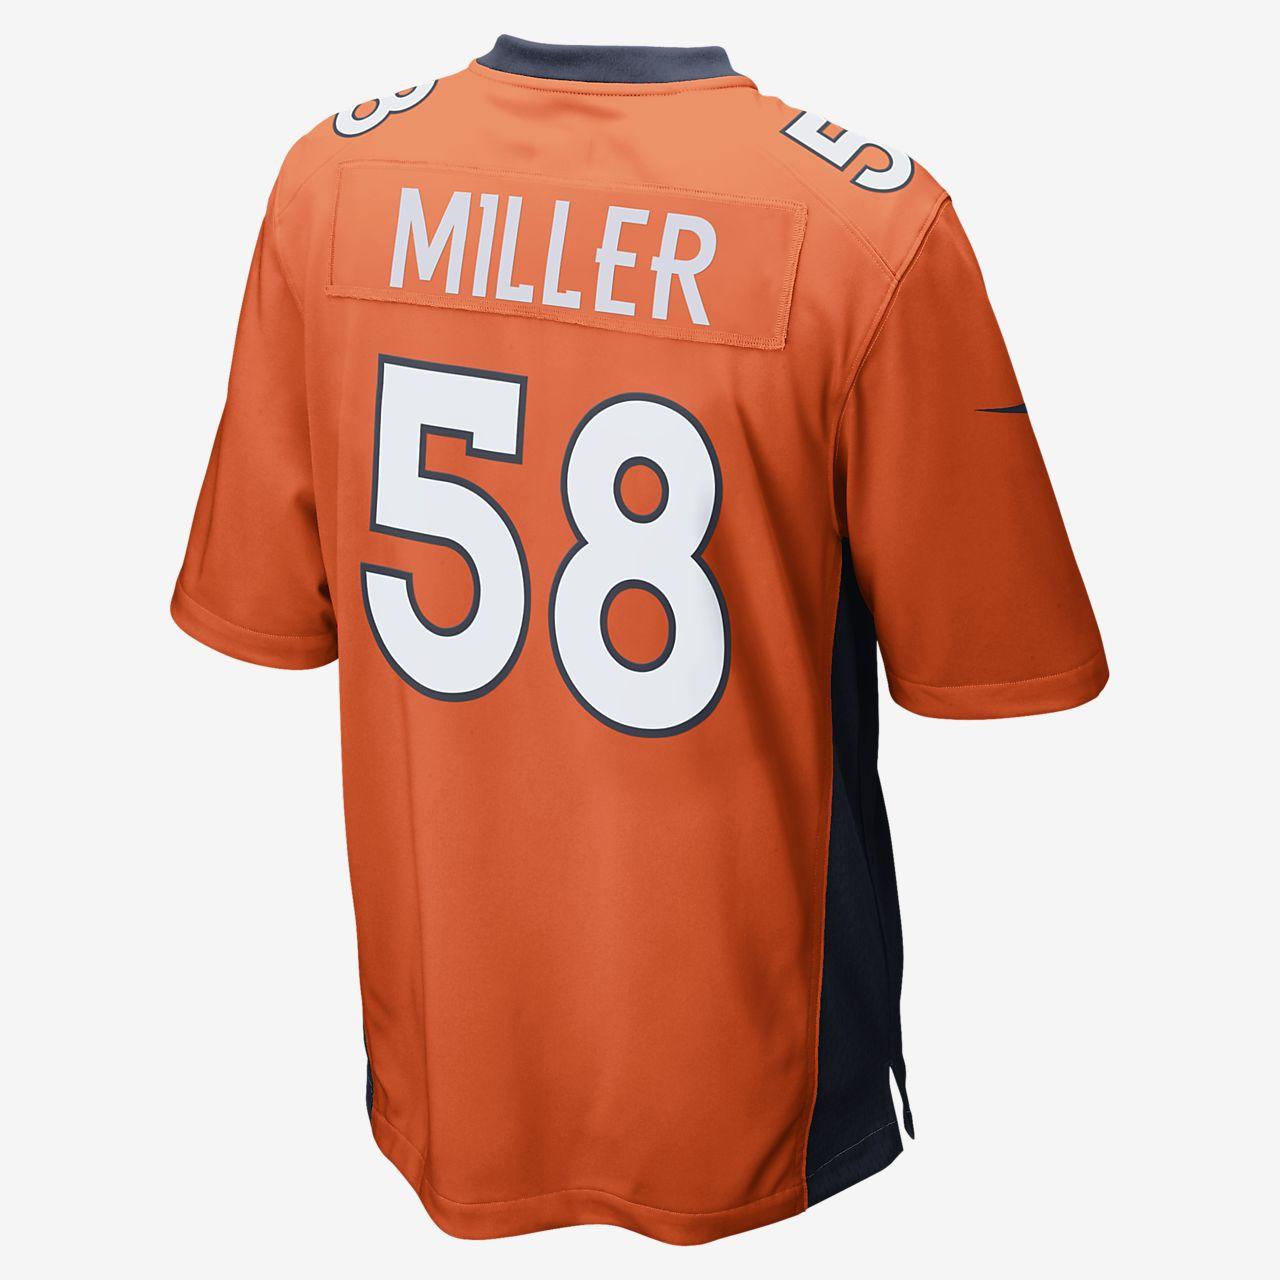 f42dae5df05 NFL Denver Broncos (Von Miller) Men's Game American Football Jersey ...